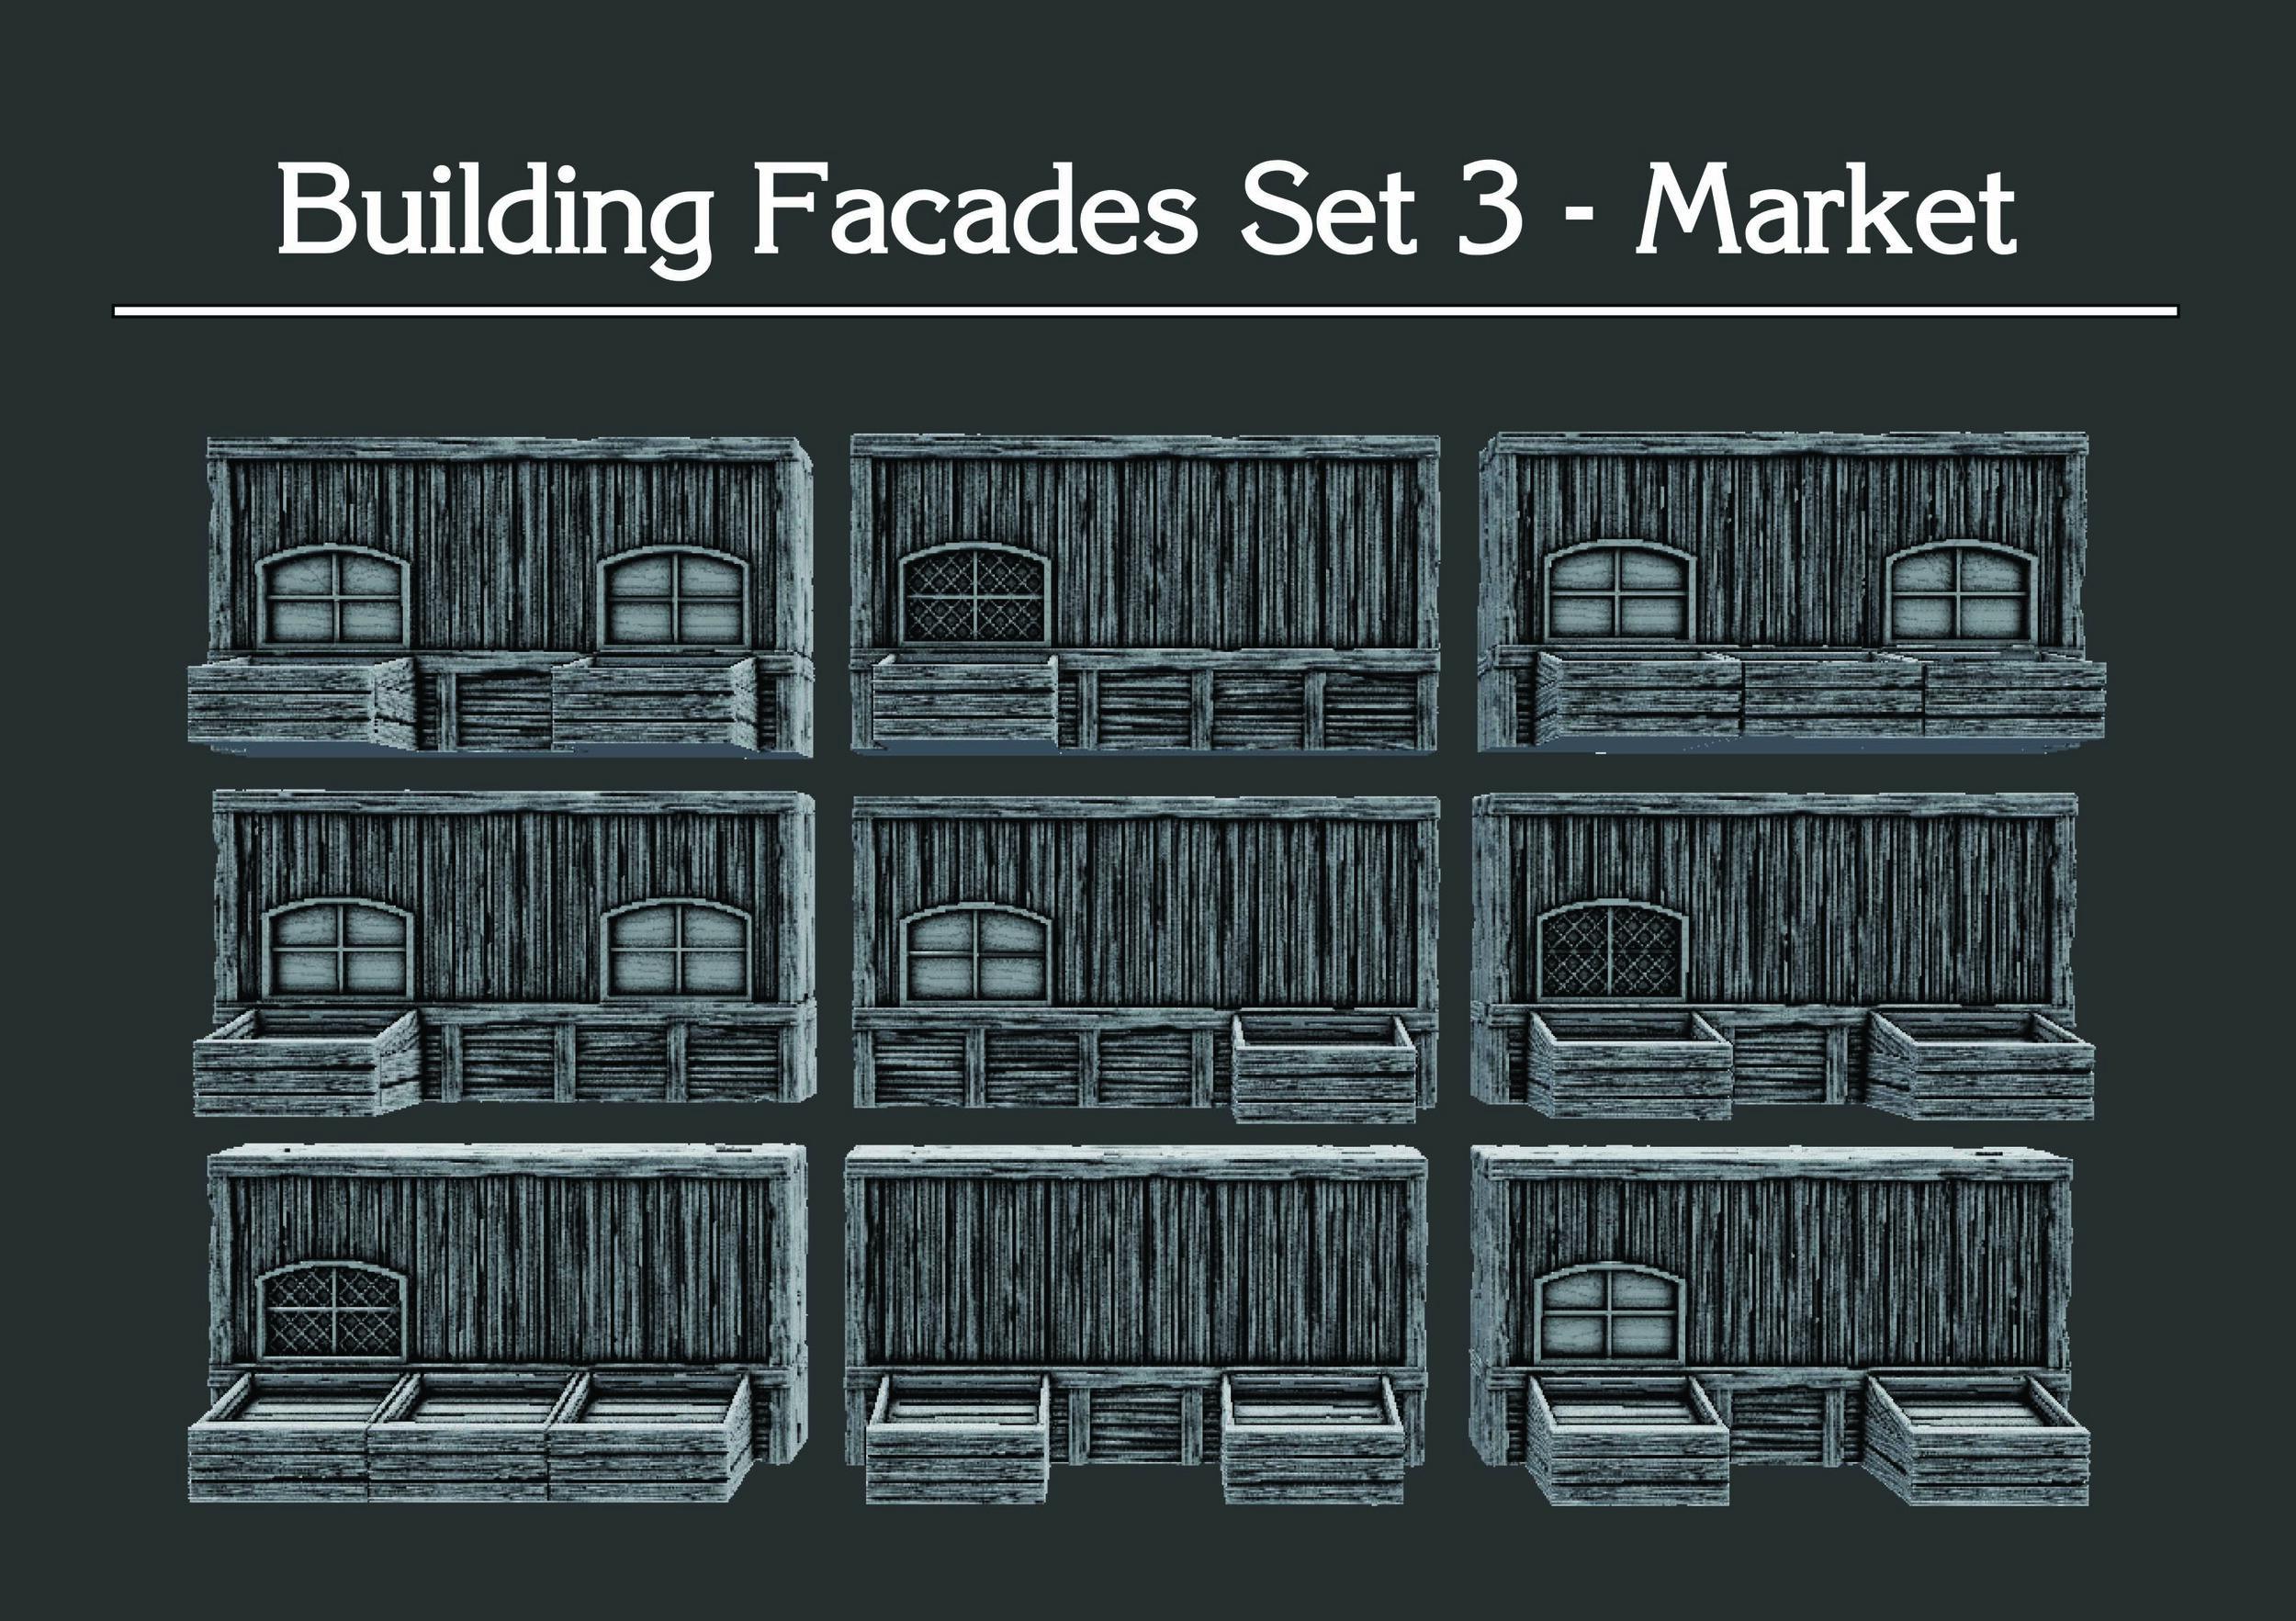 Building Facades Set 3 Market 1.0.jpg